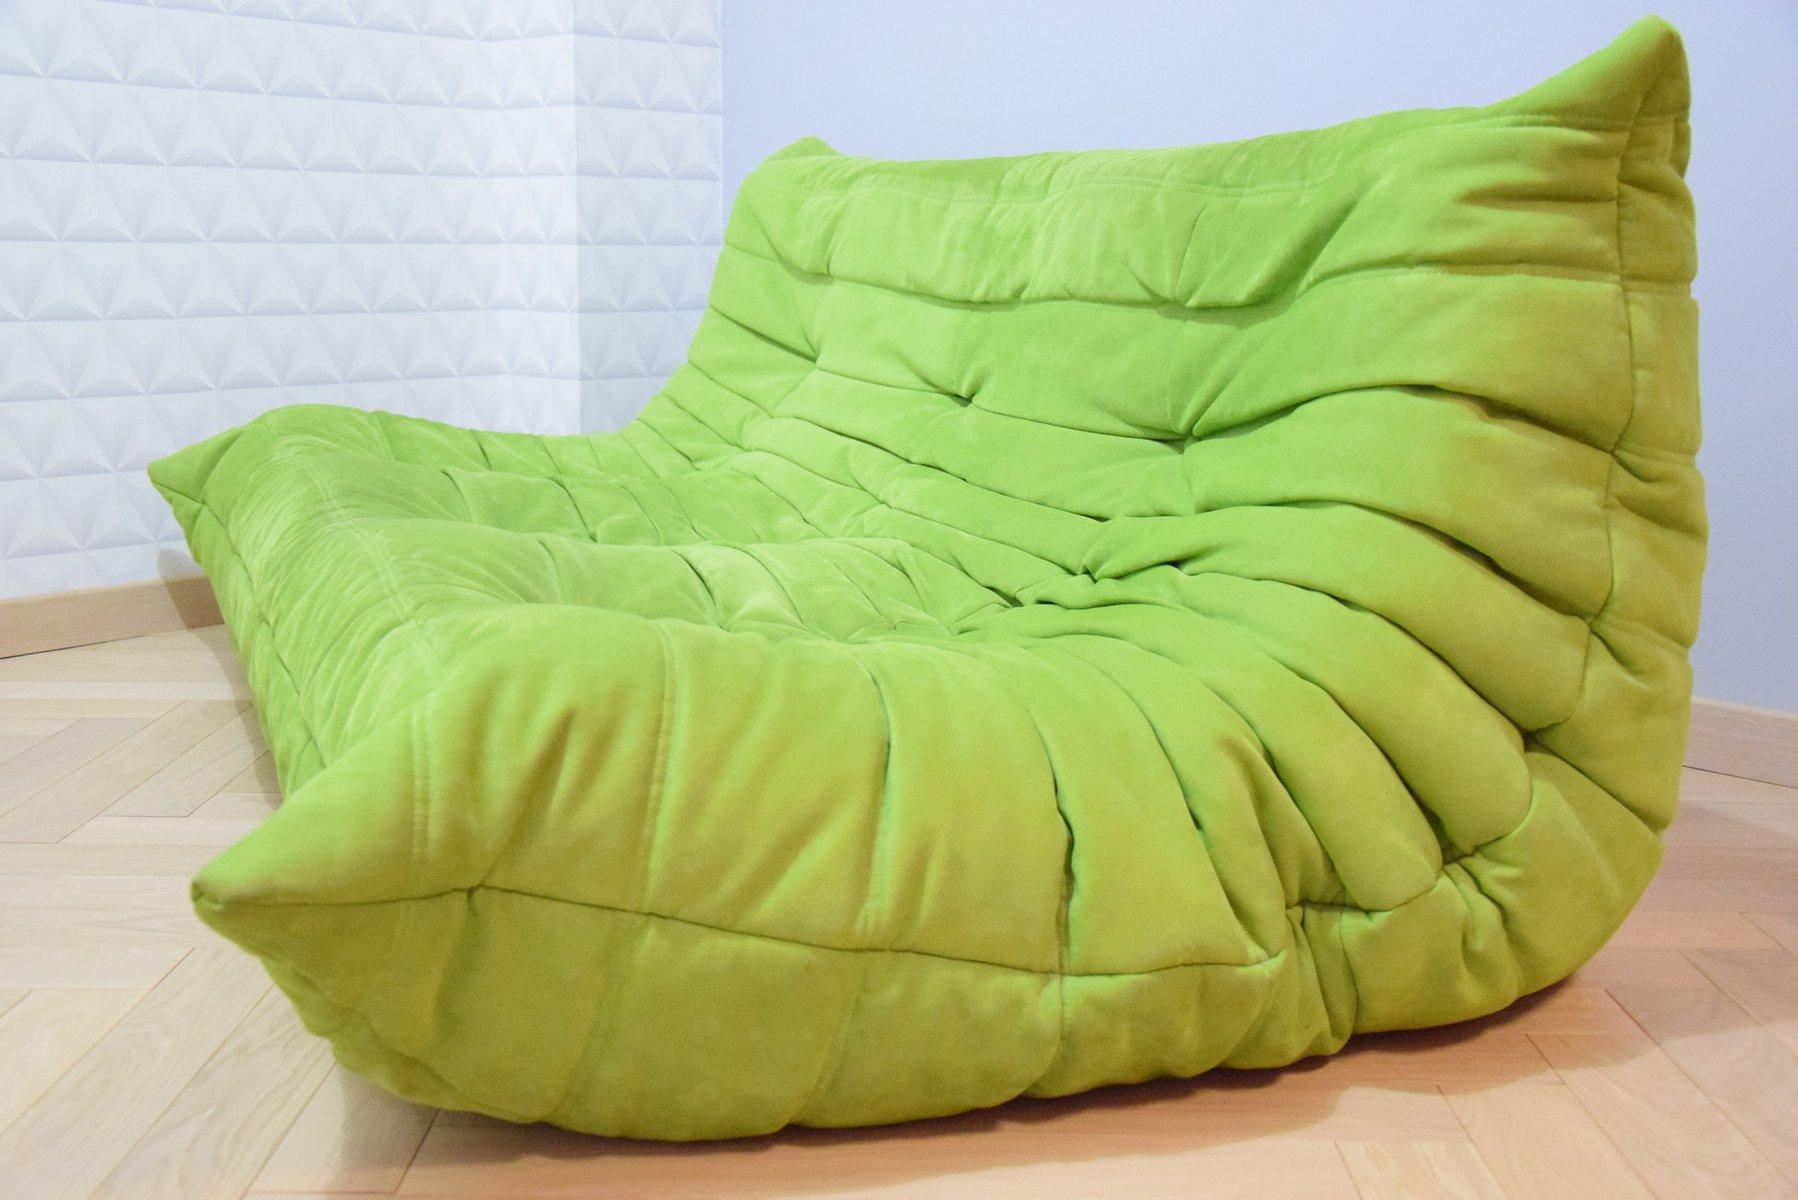 canap togo vintage de ligne roset en vente sur pamono. Black Bedroom Furniture Sets. Home Design Ideas